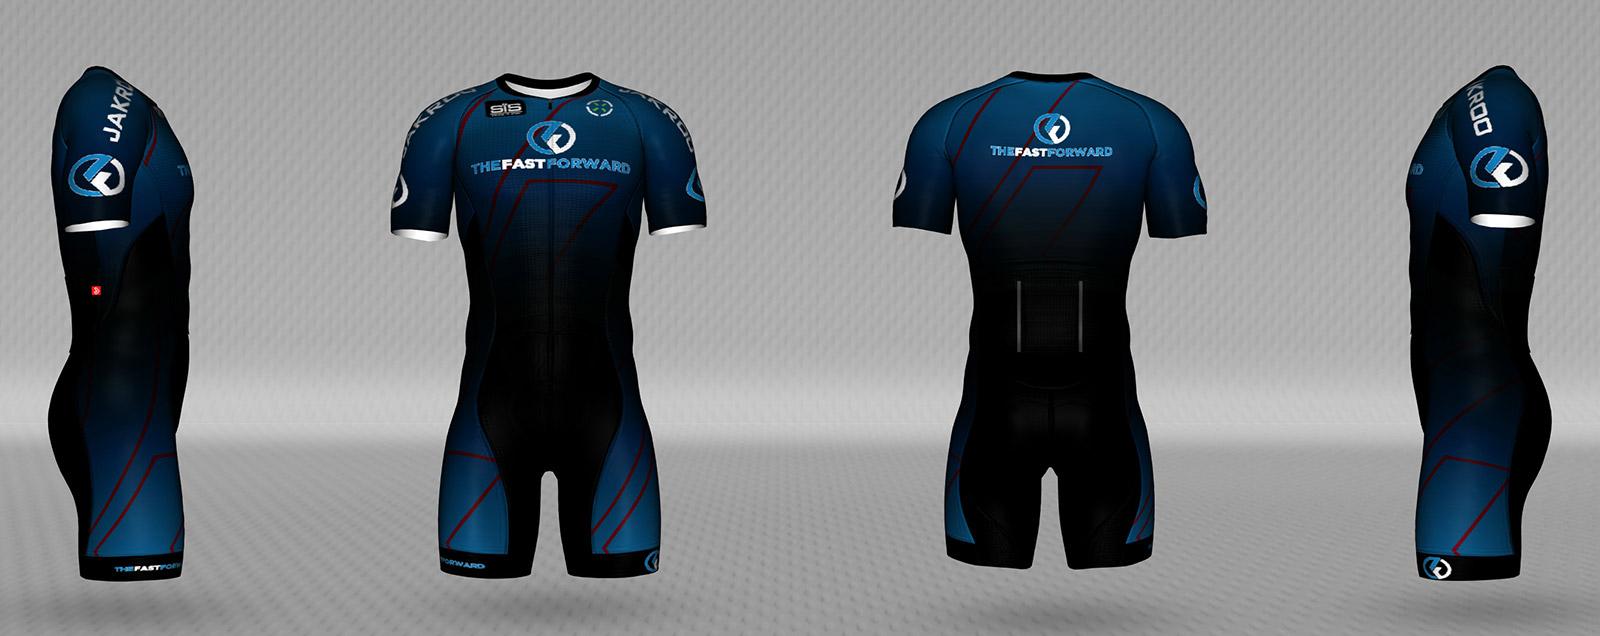 The Echelon Short Sleeve Race Suit